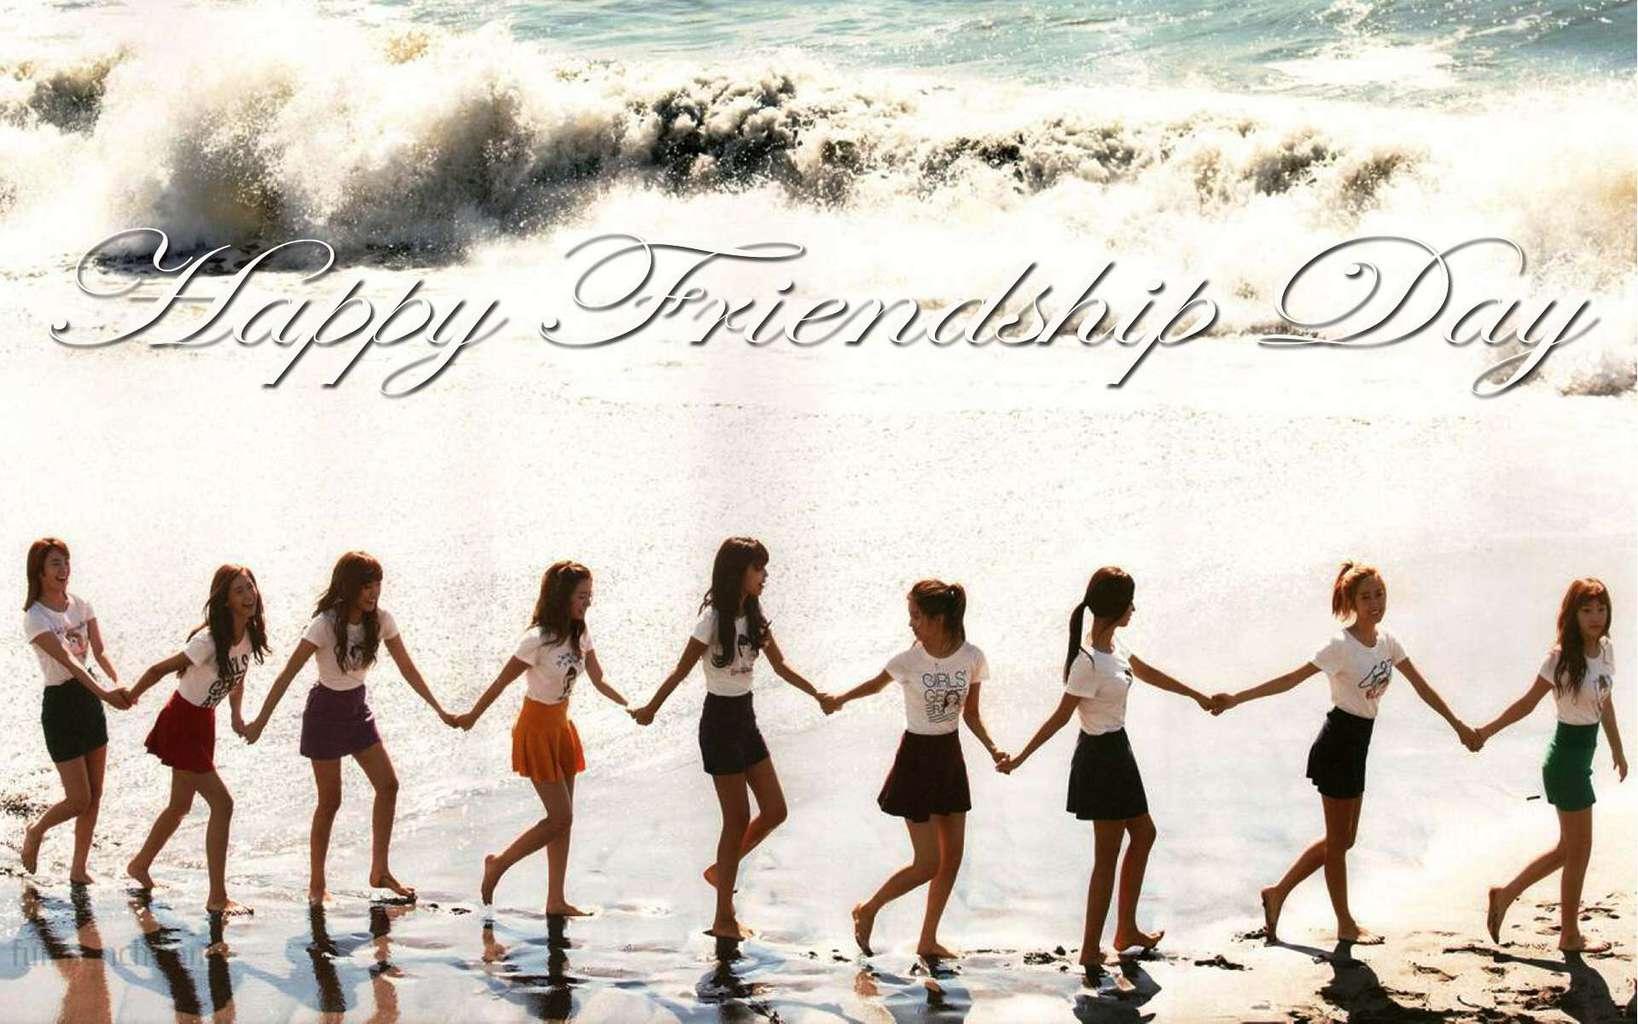 Happy-friendship-day-girls-hands-together1